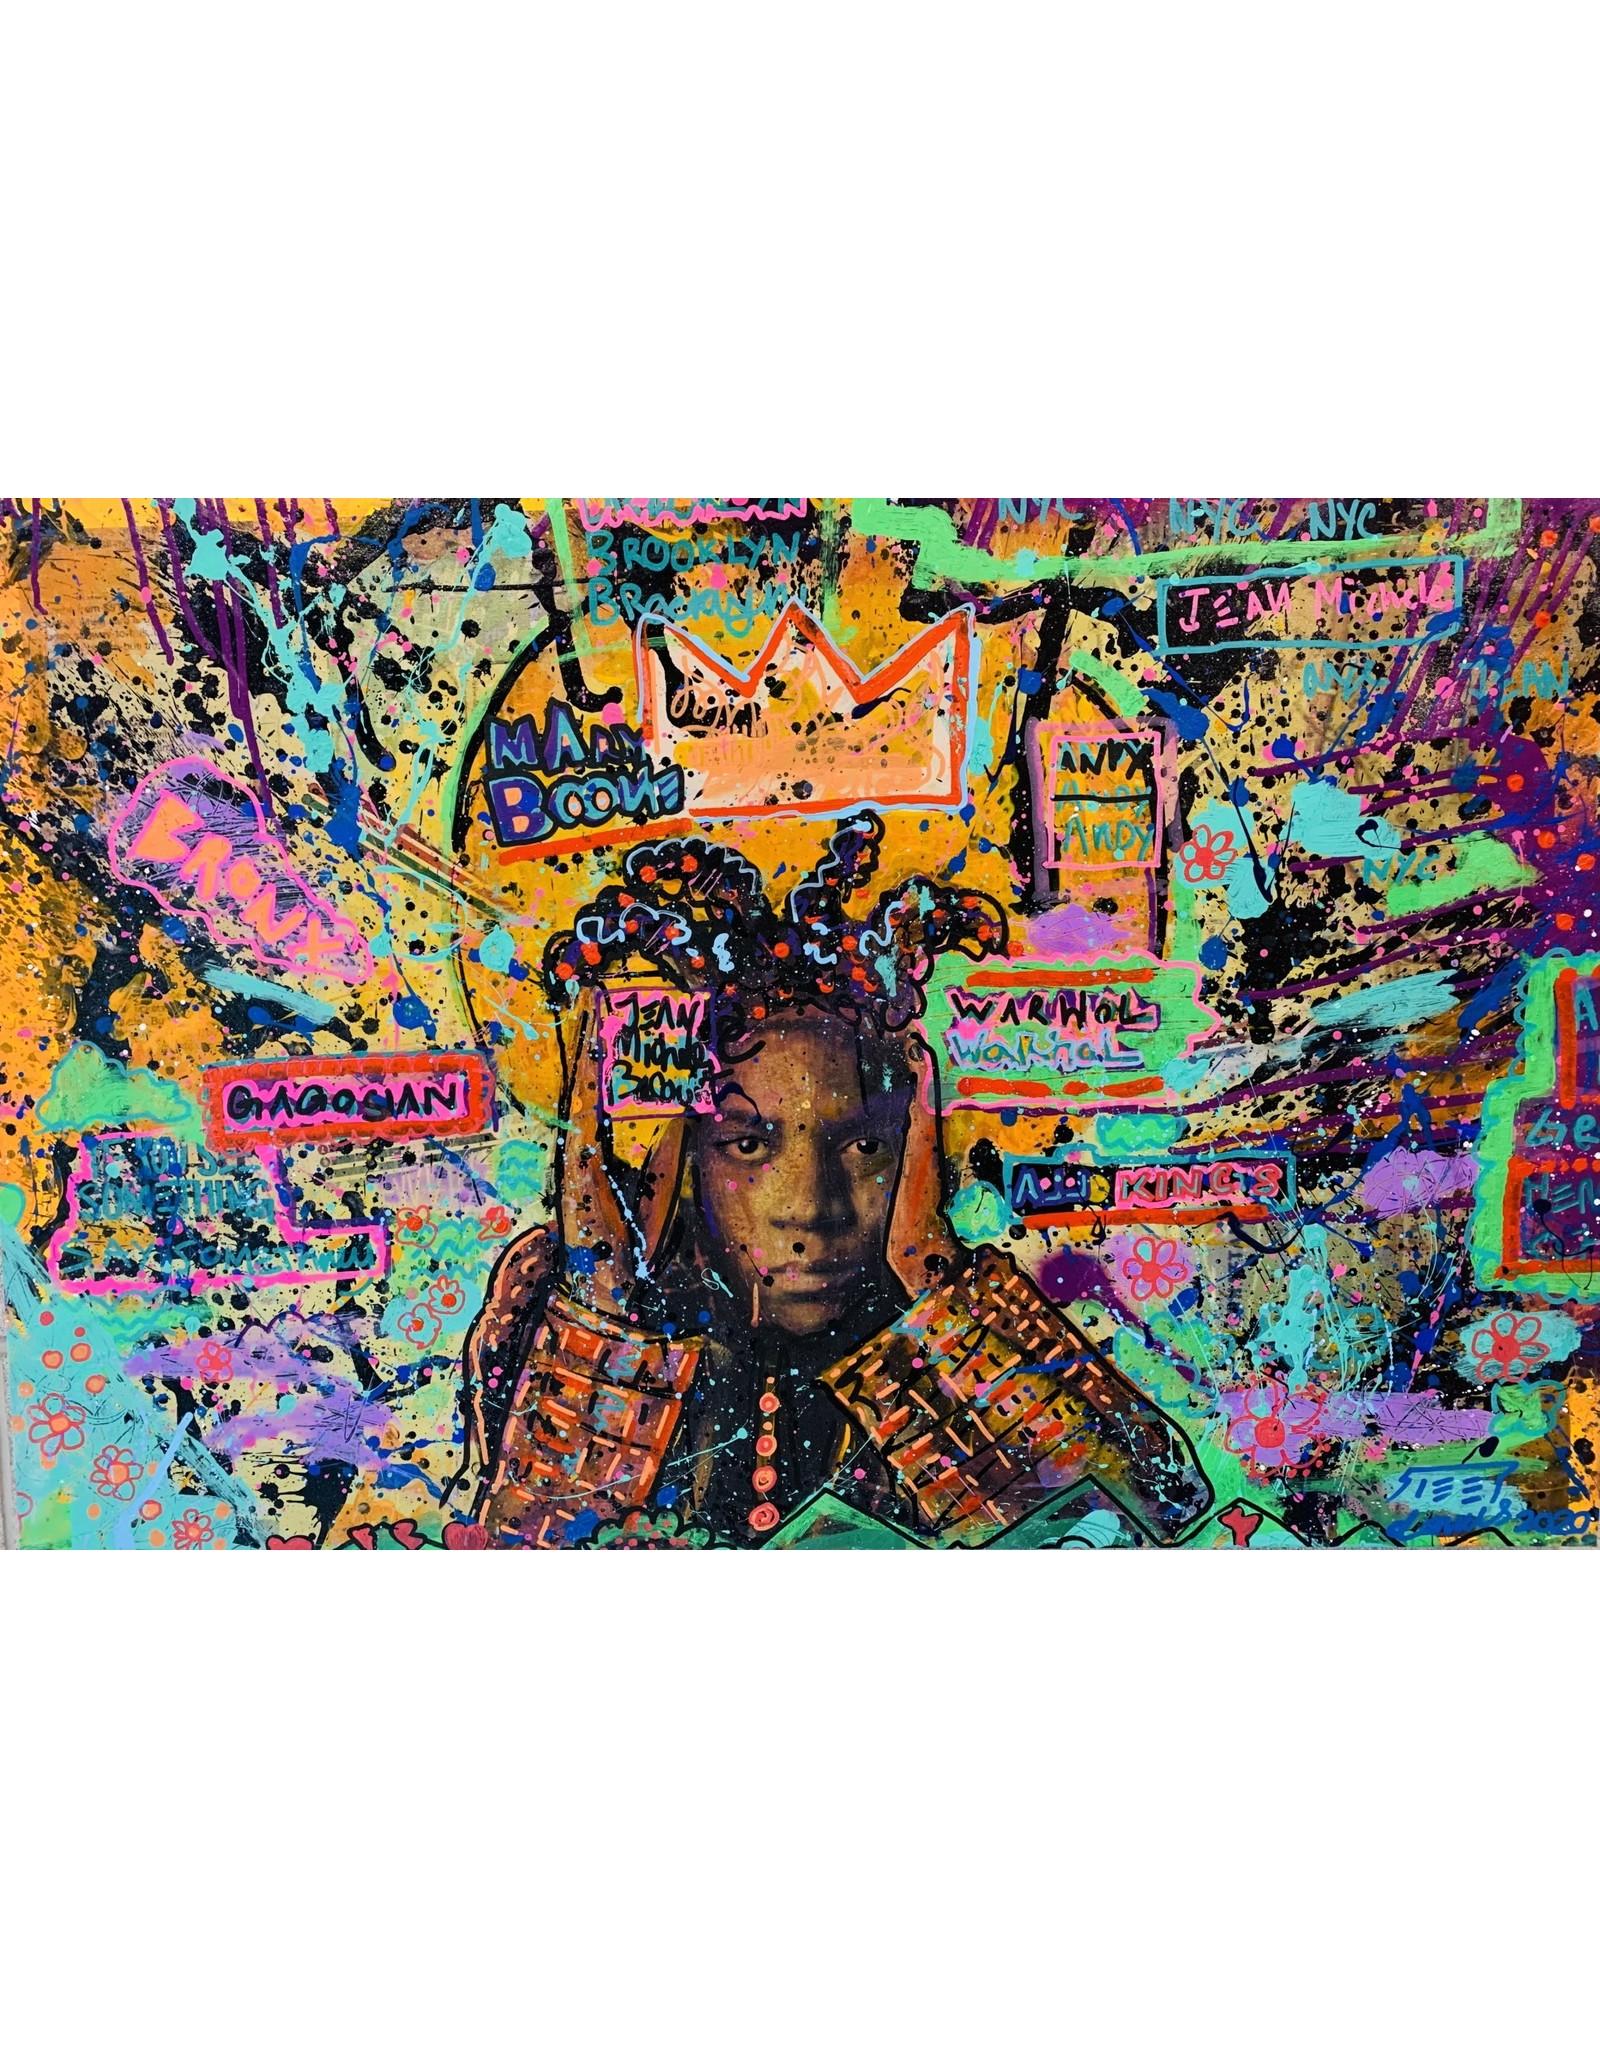 STEEP Daniels STEEP Daniels - Jean Michel Basquiat - Gauguin